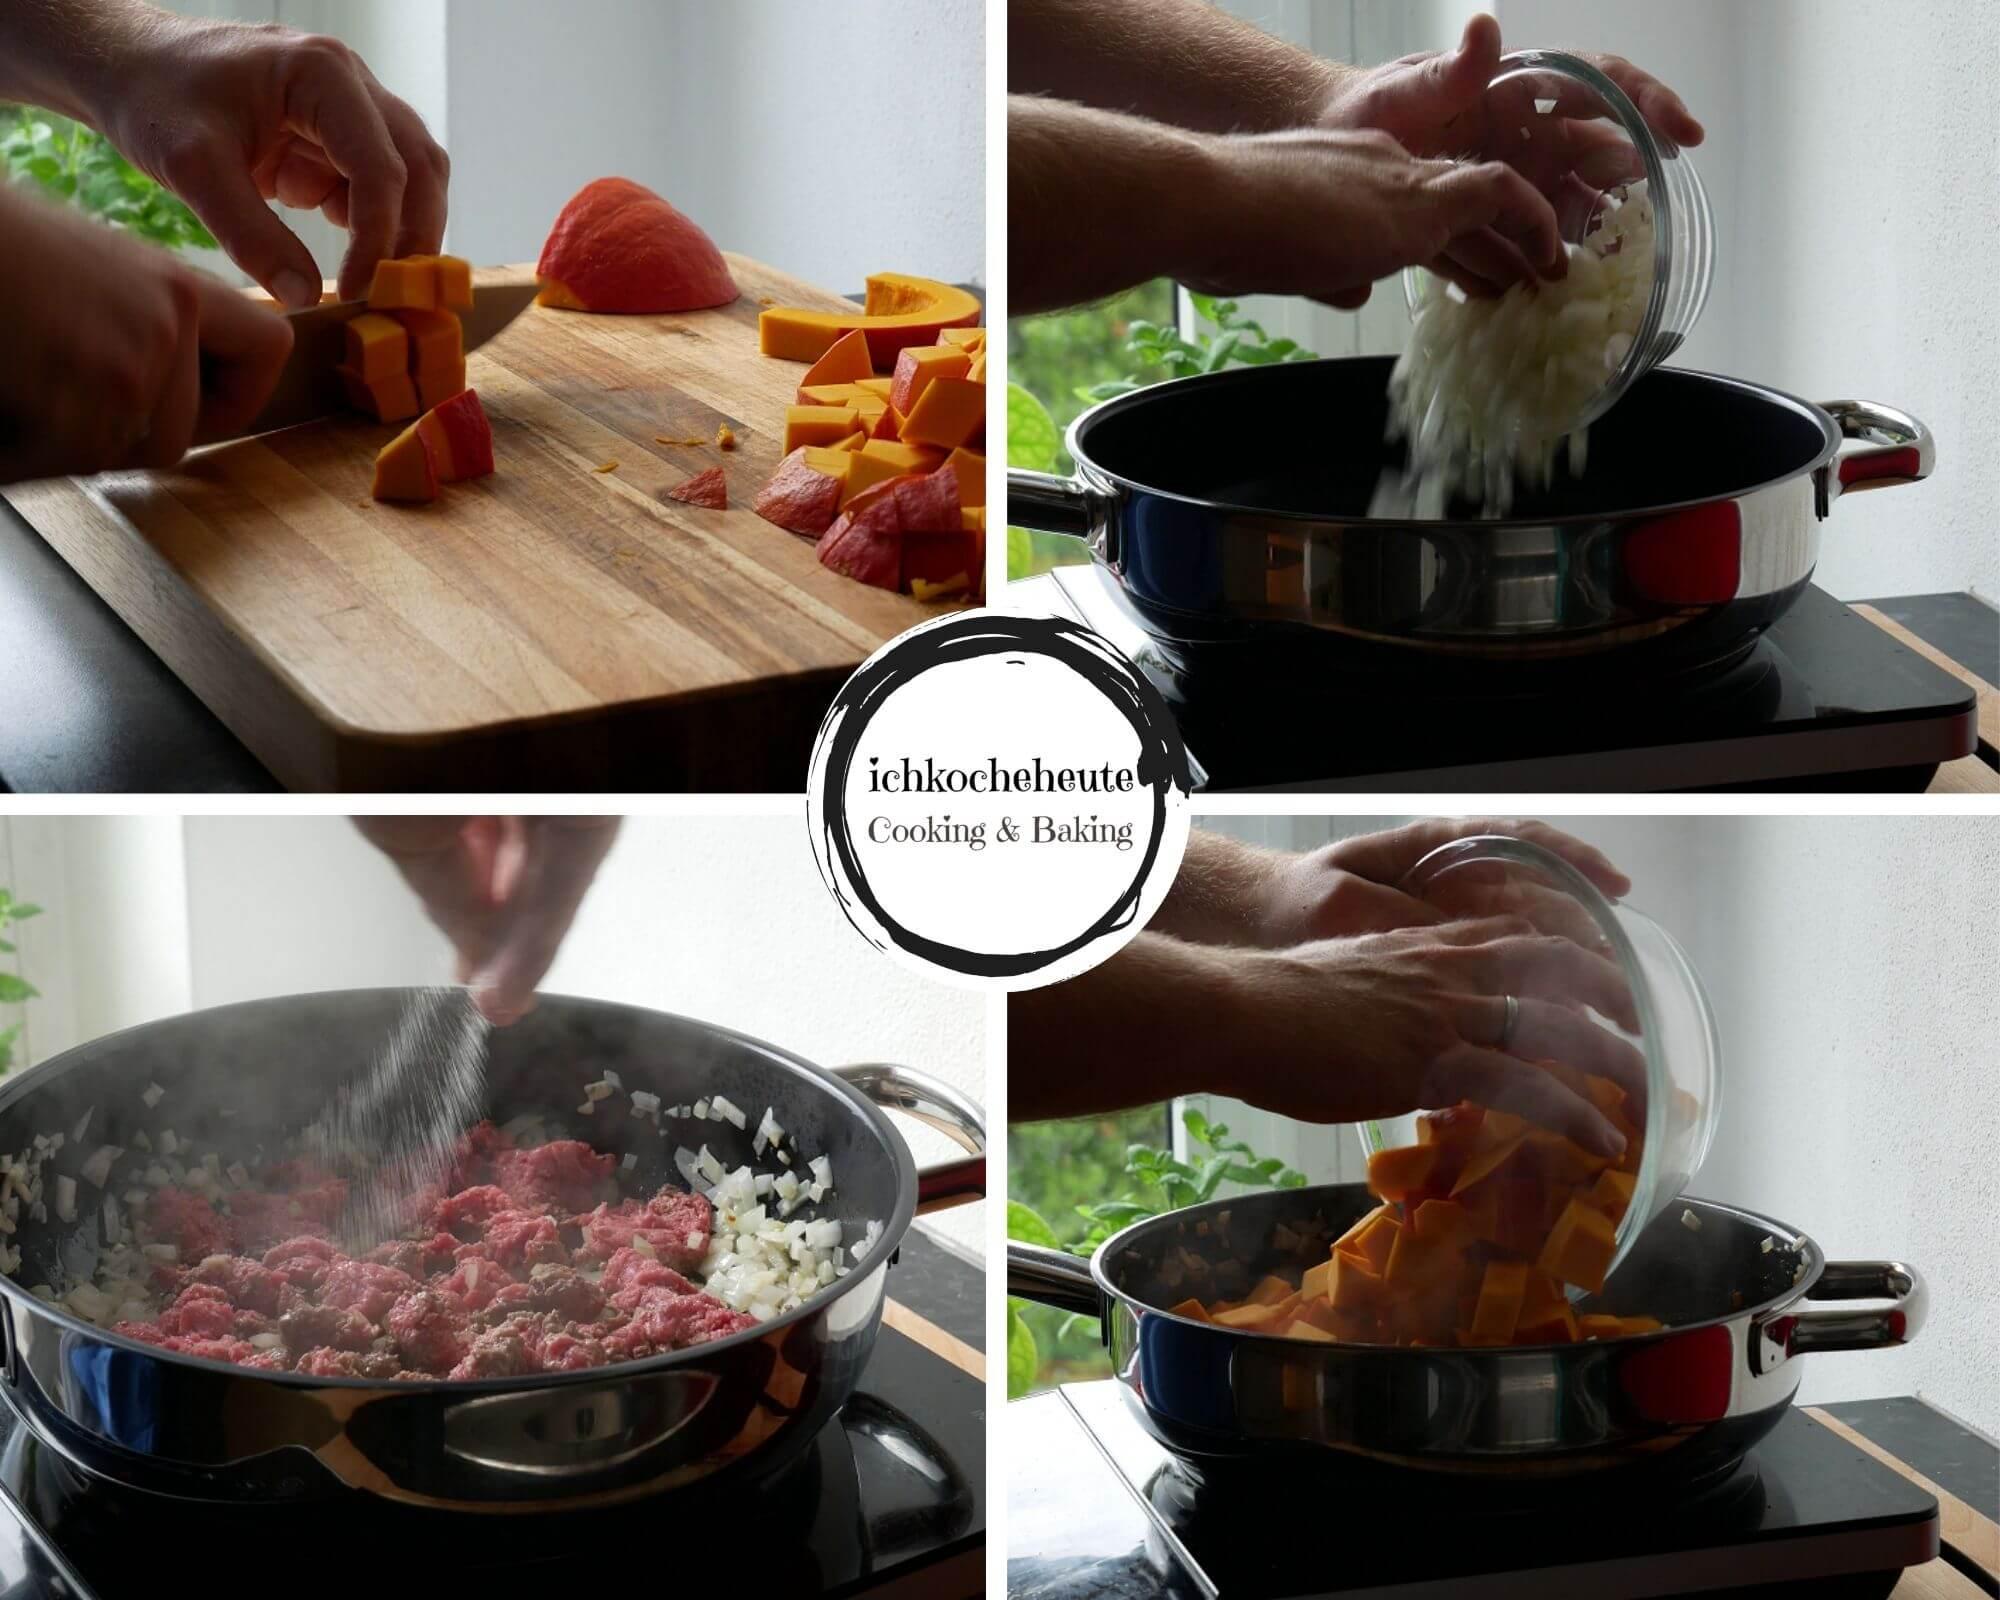 Preparations for Pumpkin Gnocchi Stir Fry with Ground Beef